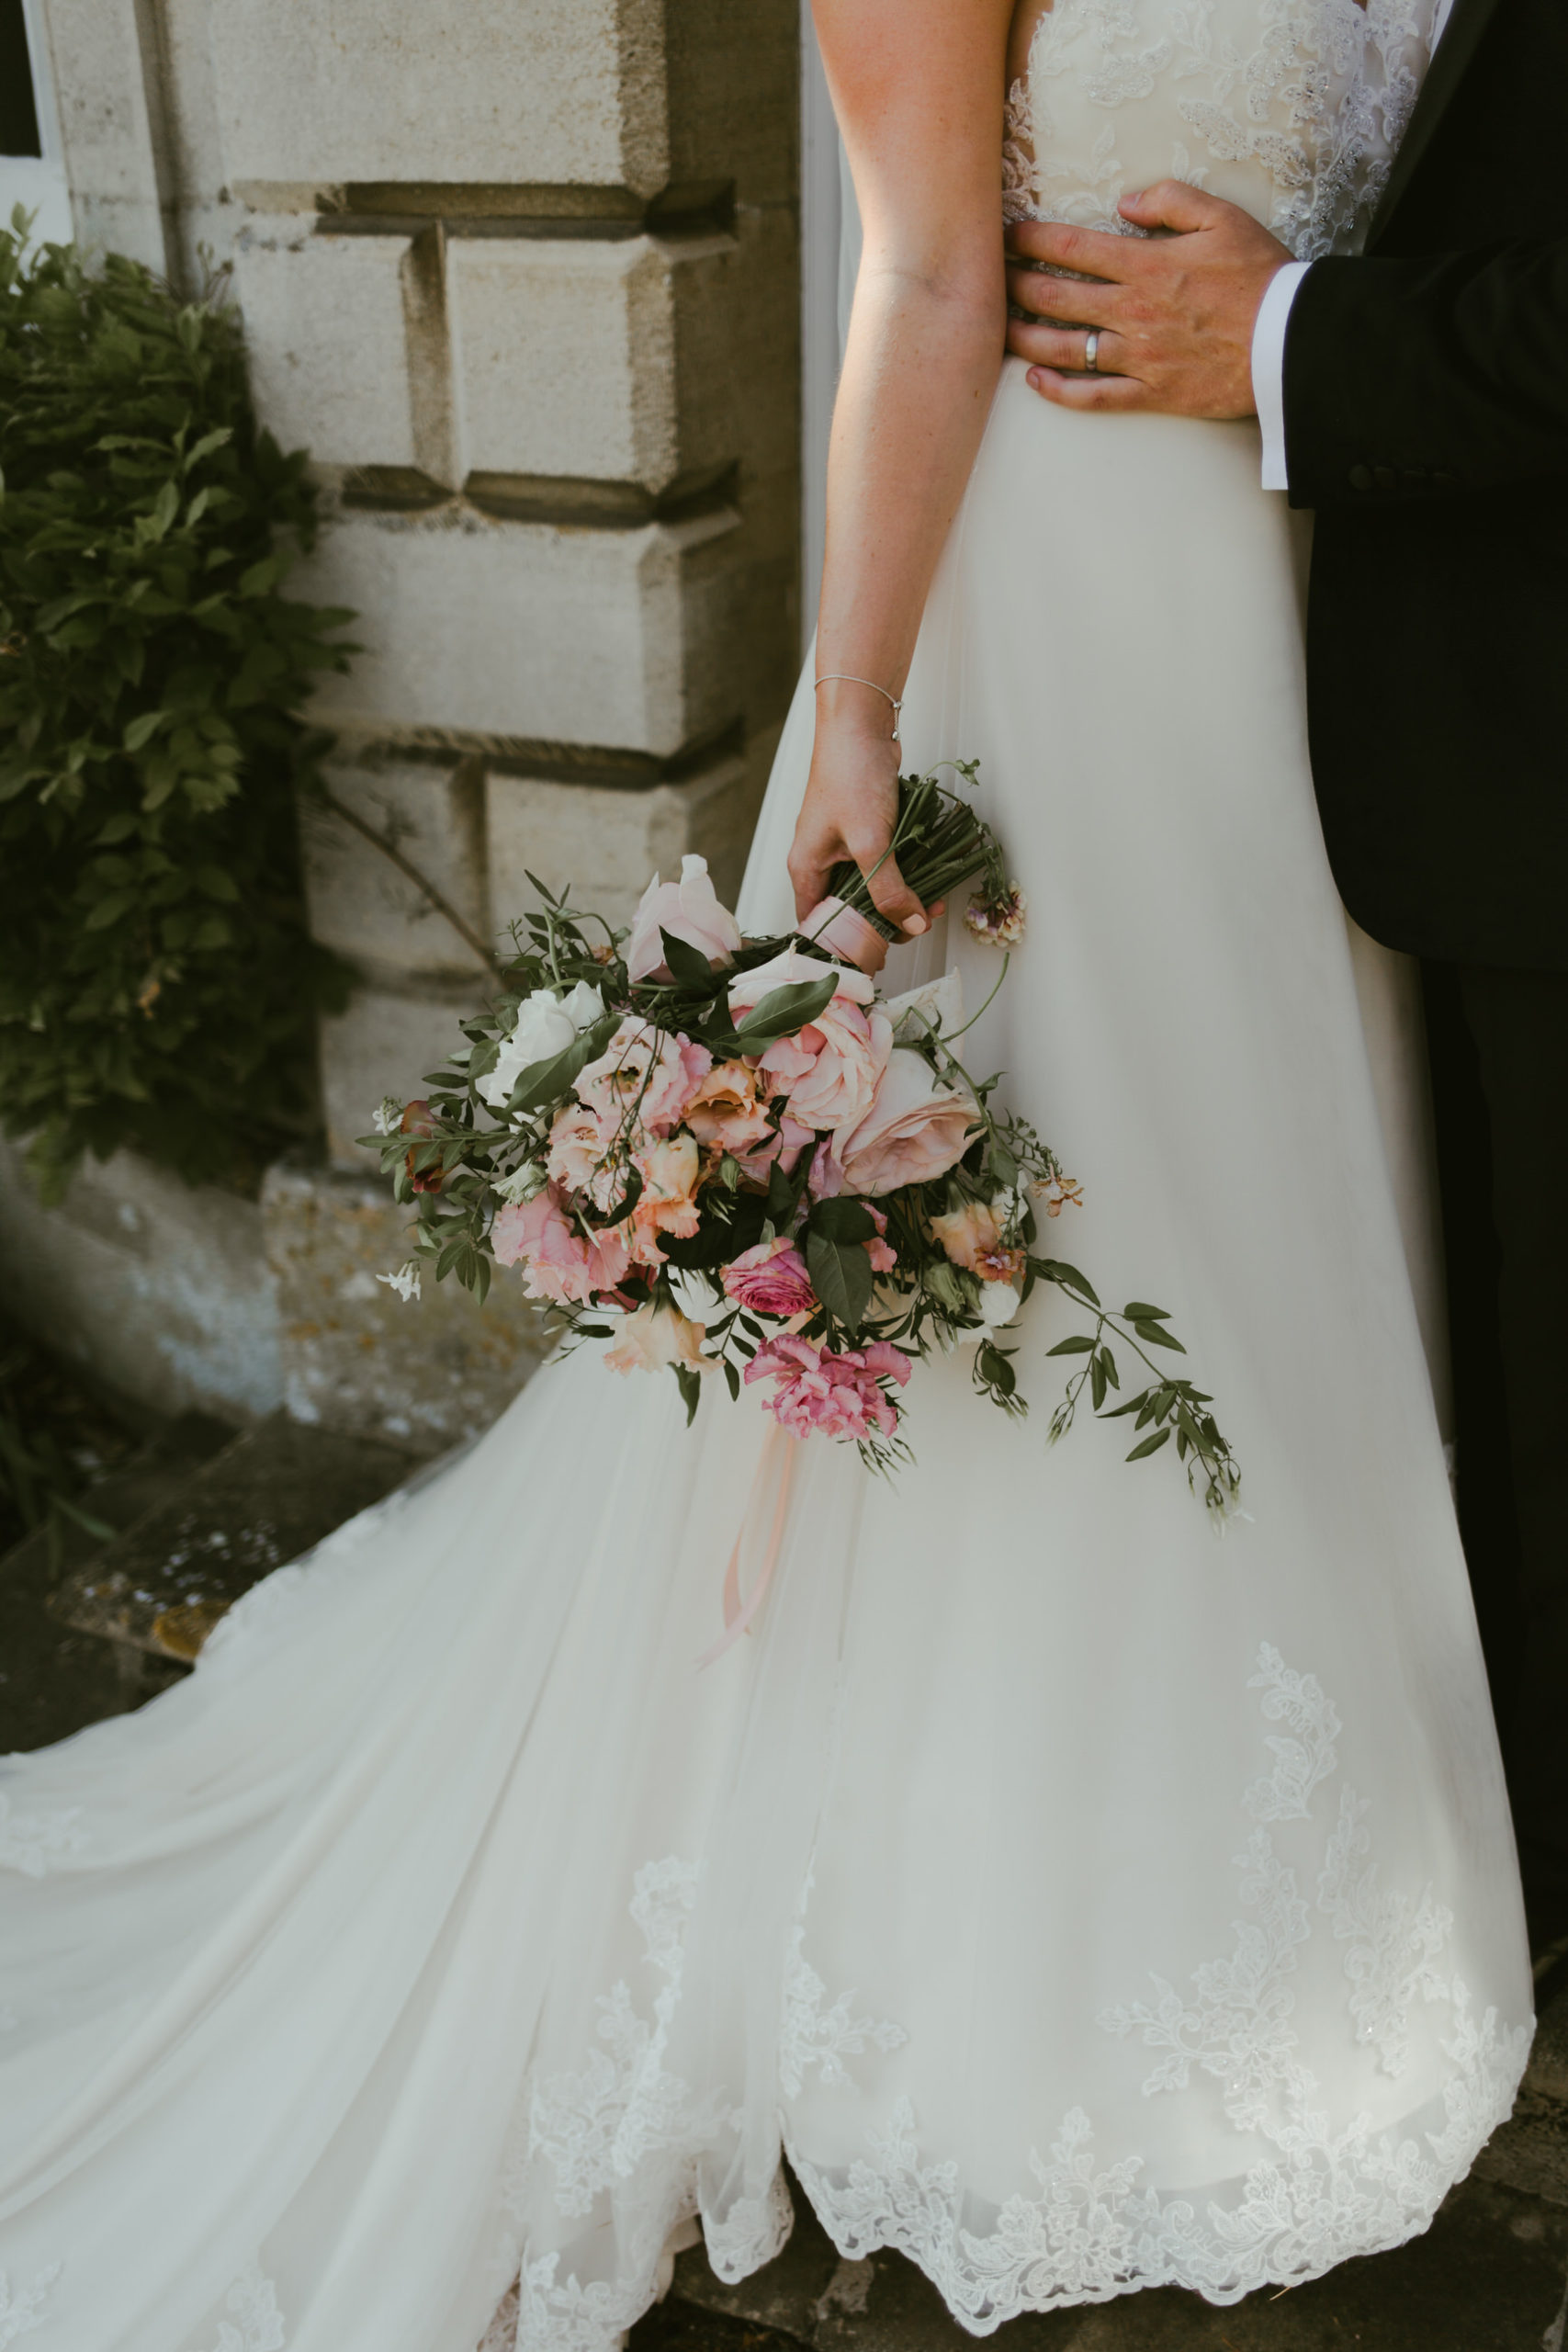 summer back garden wedding bride and groom photos florals bouquet